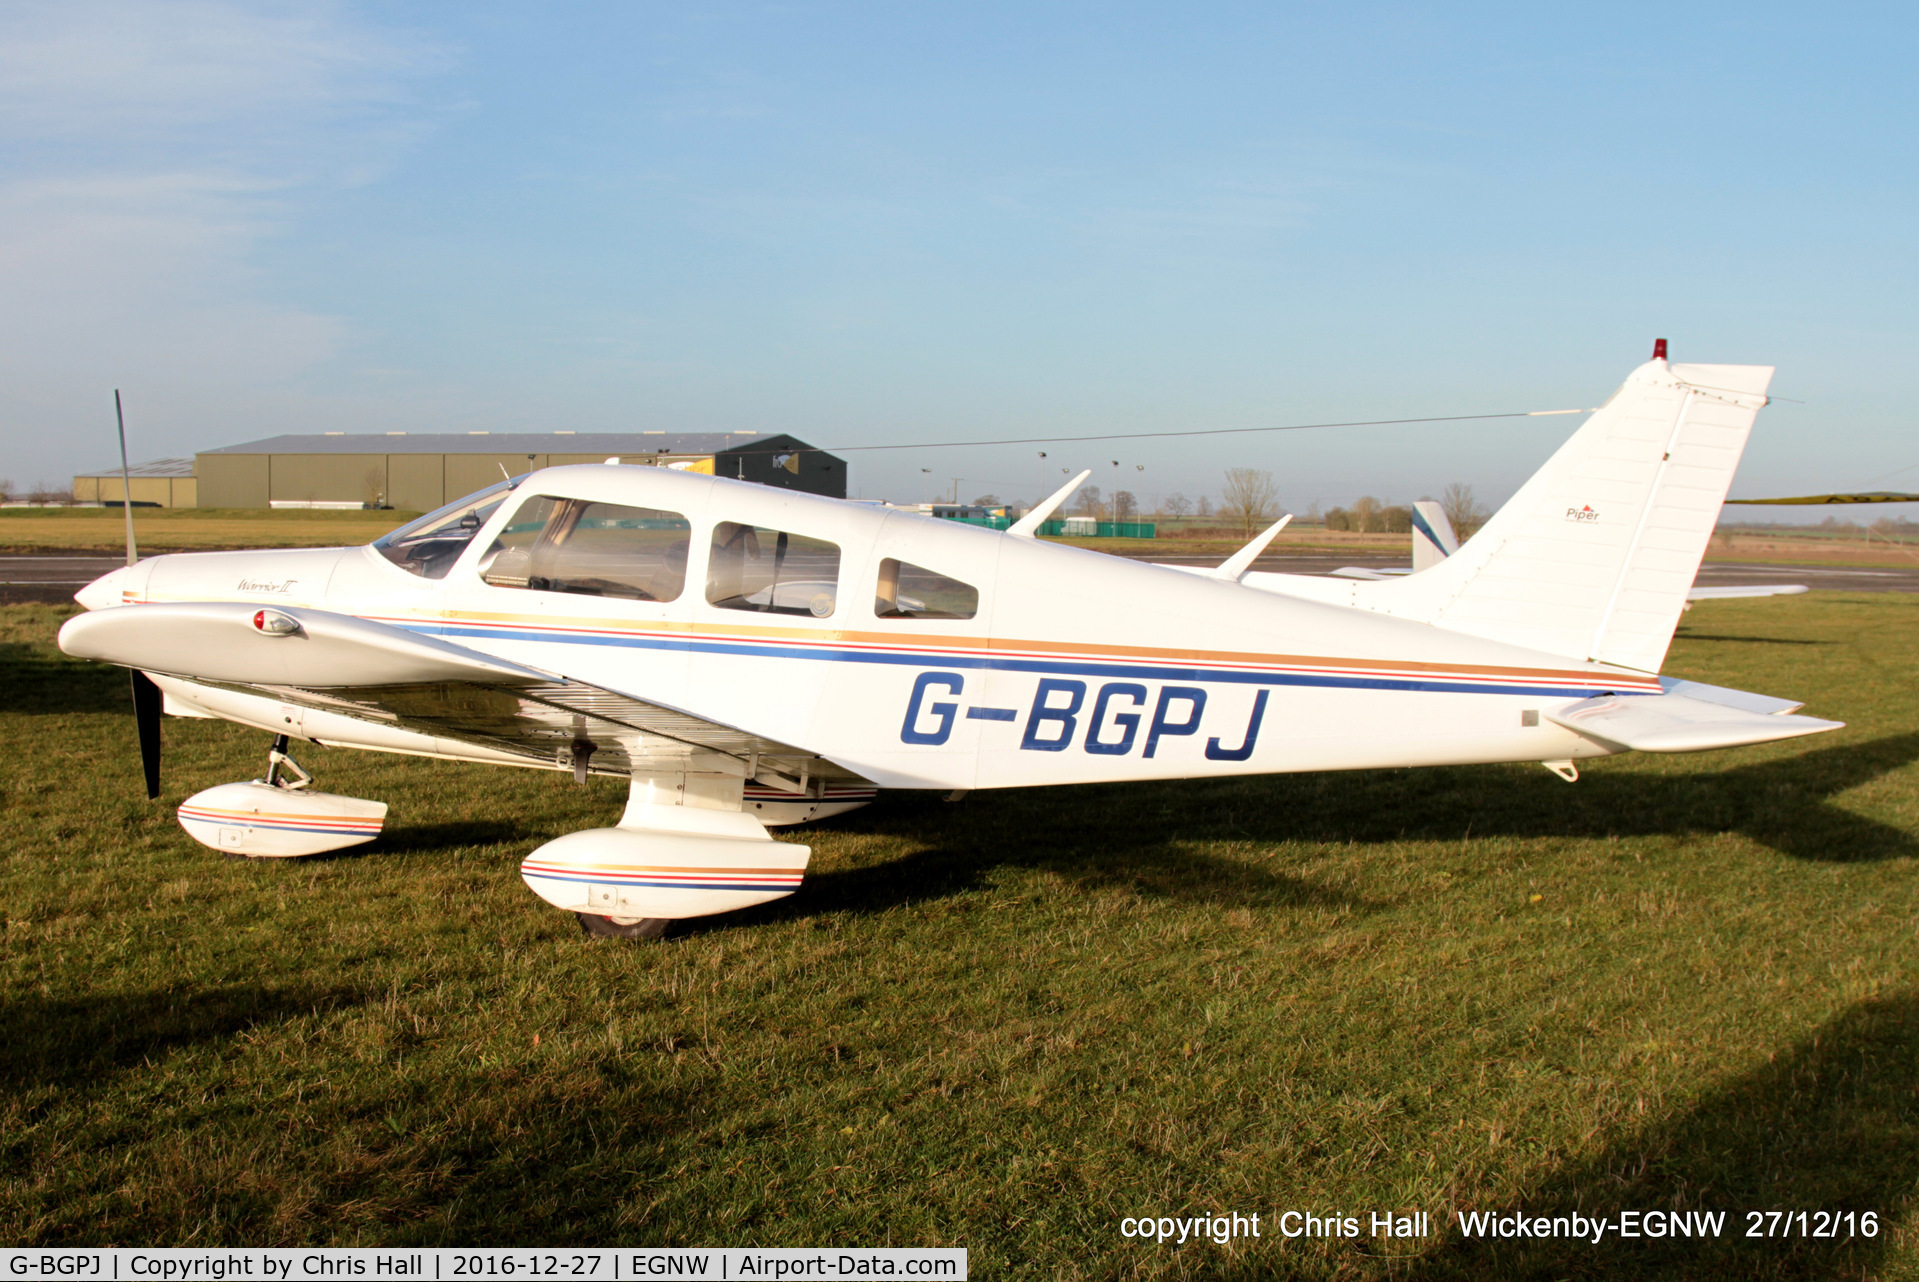 G-BGPJ, 1979 Piper PA-28-161 Cherokee Warrior II C/N 28-7916288, at the Wickenby